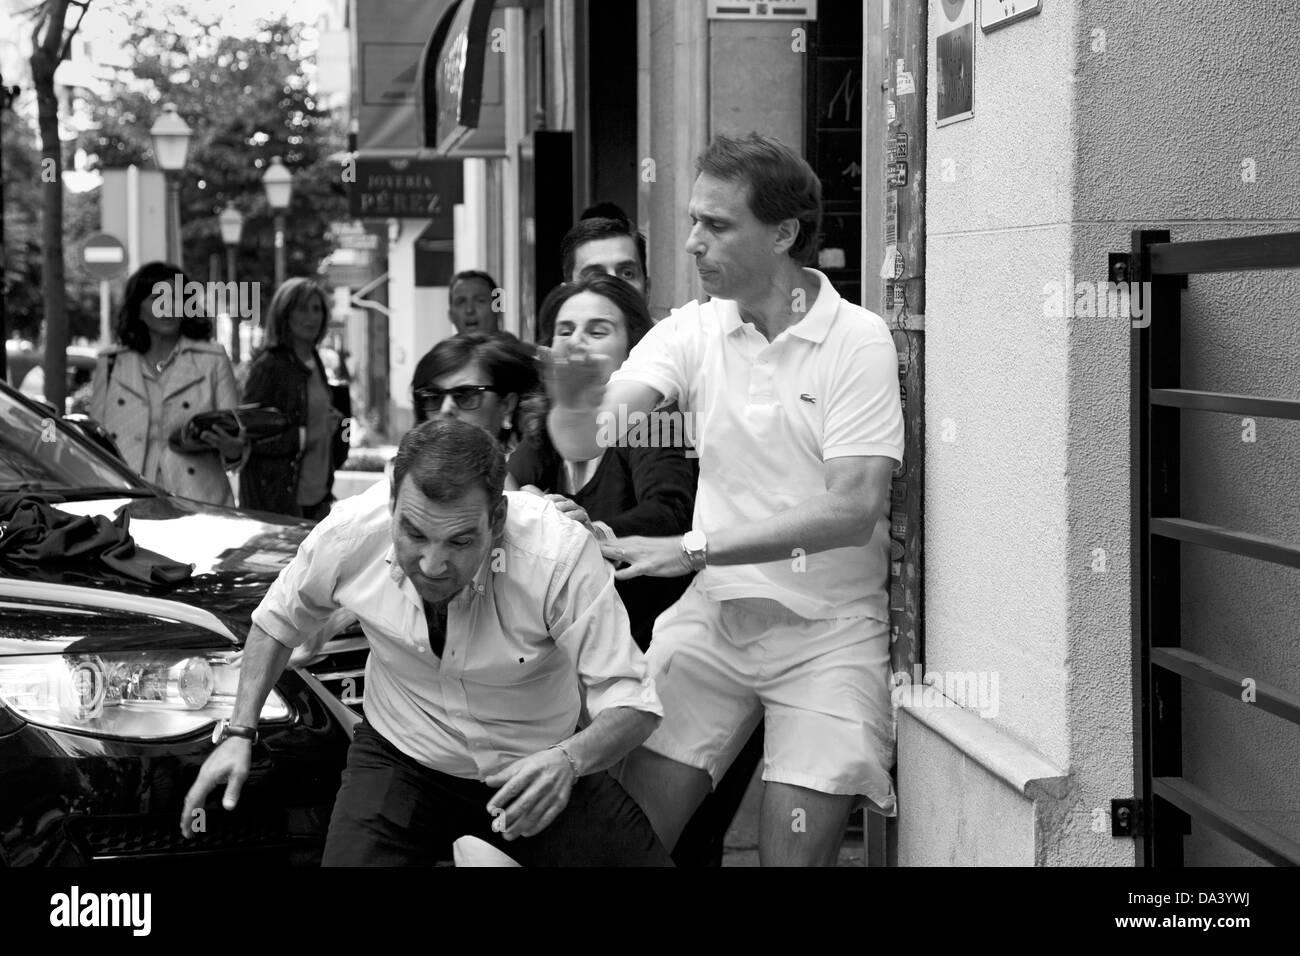 Street brawl, Madrid, Spain - Stock Image